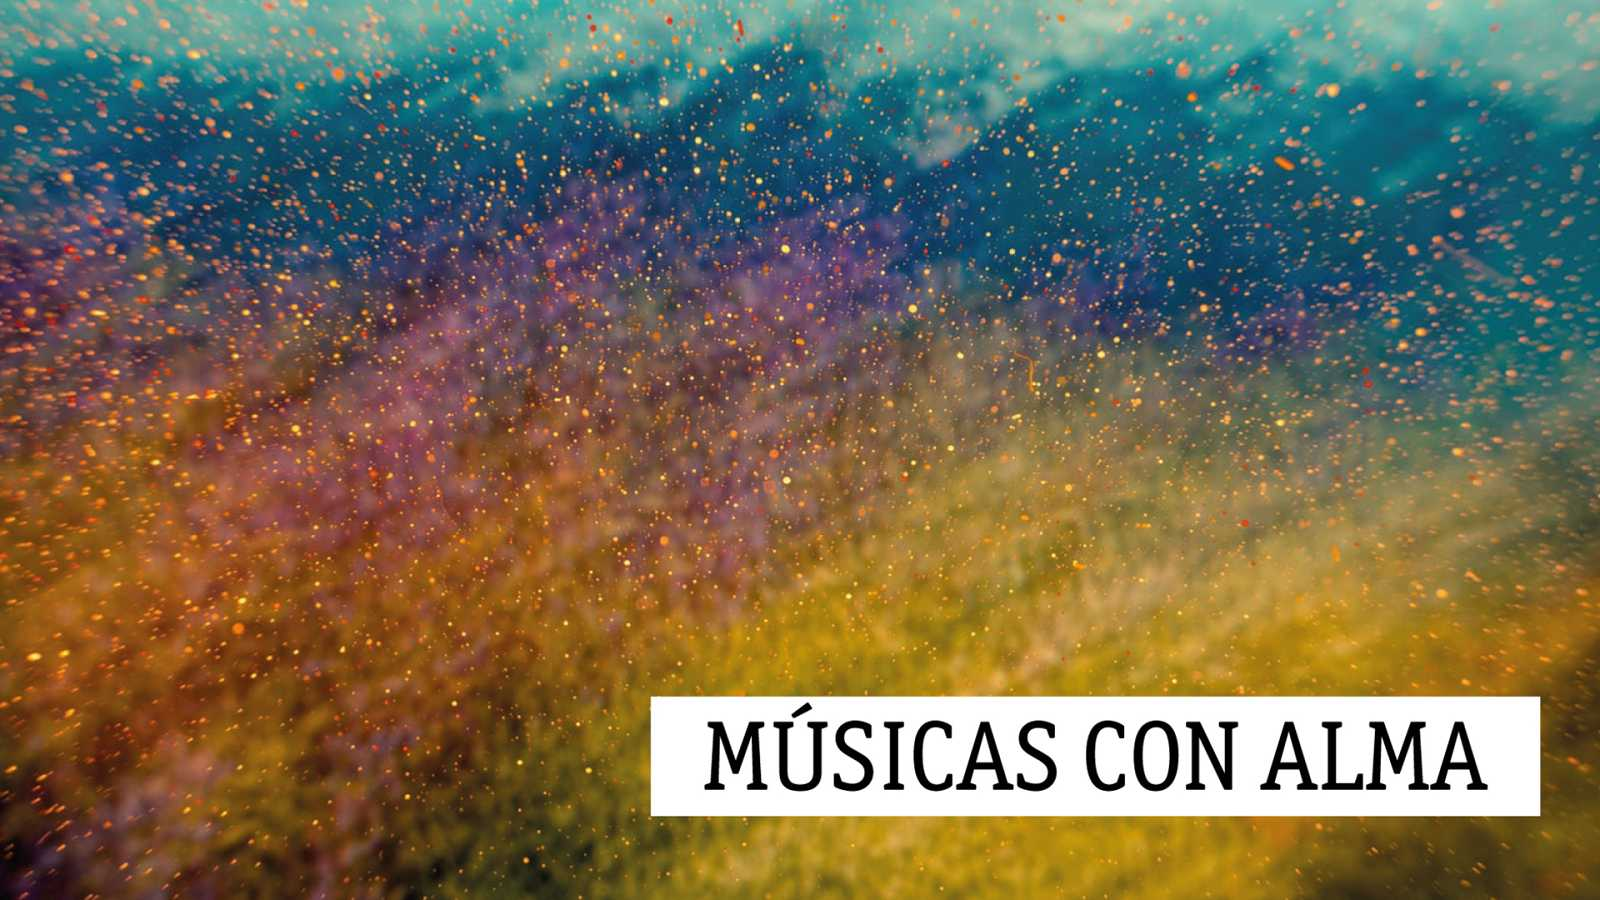 Músicas con alma - Laberinto - 27/01/21 - escuchar ahora